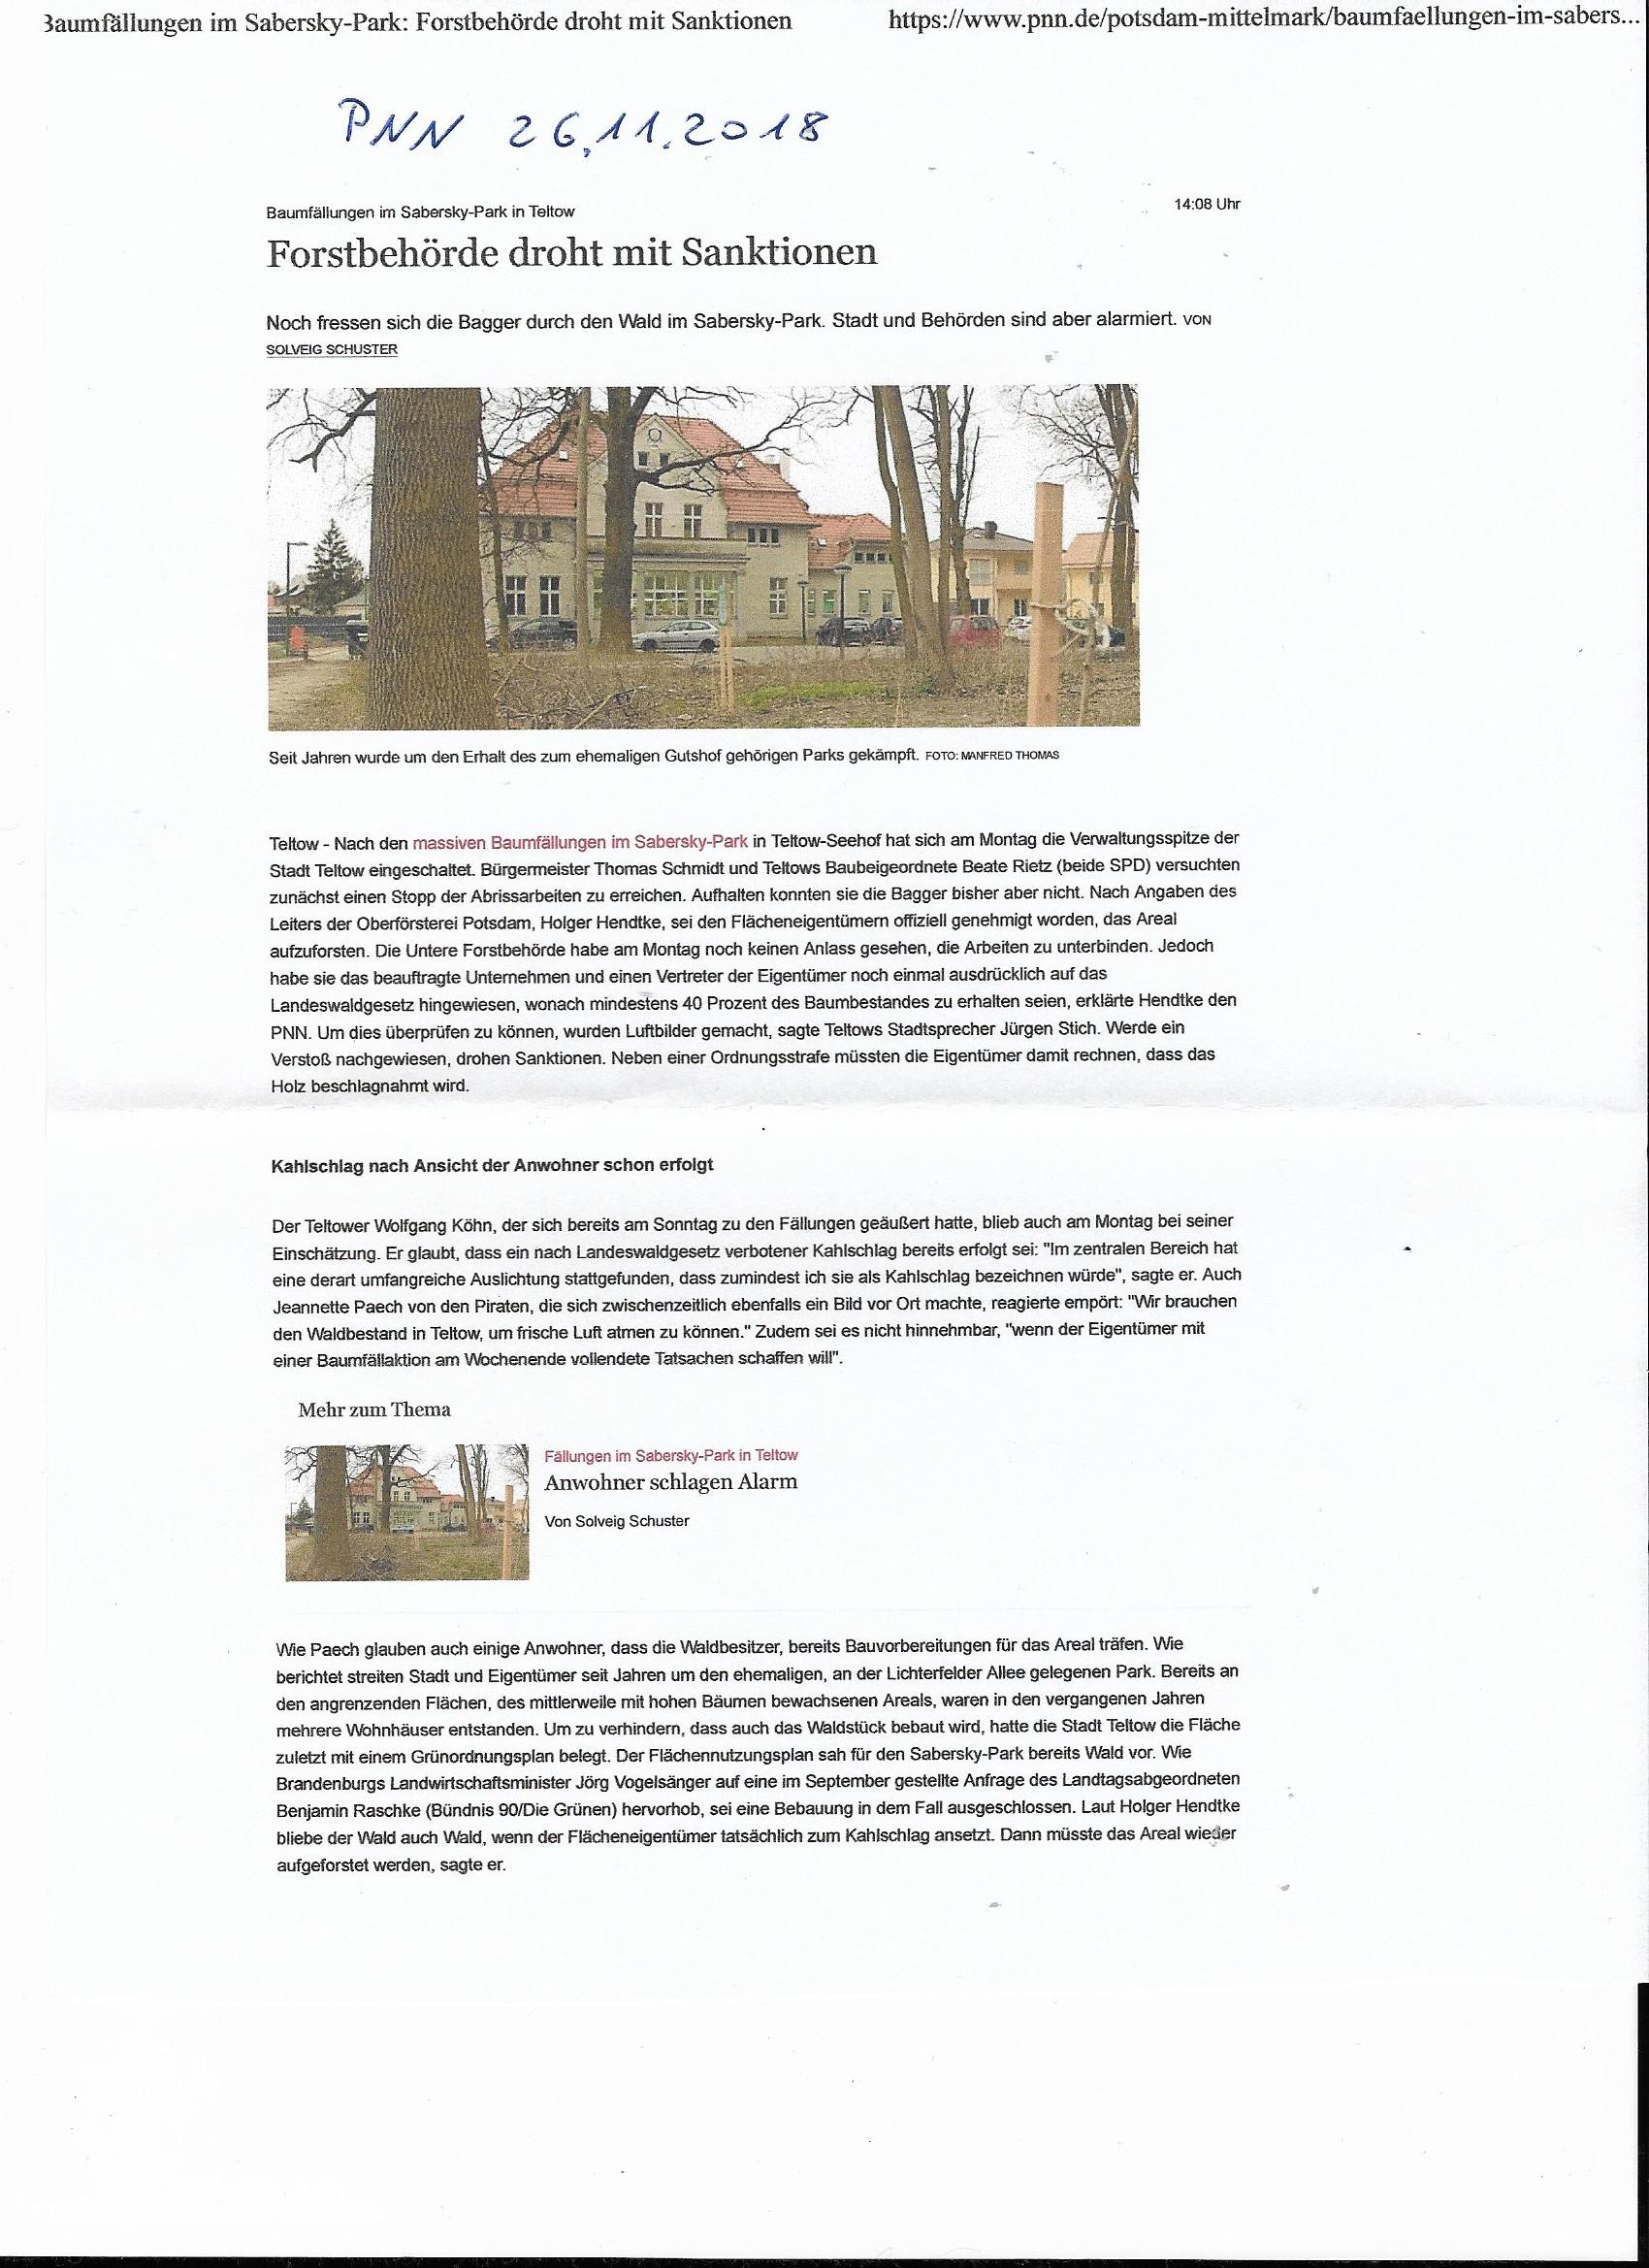 Teltow Seehof  26.11.2018